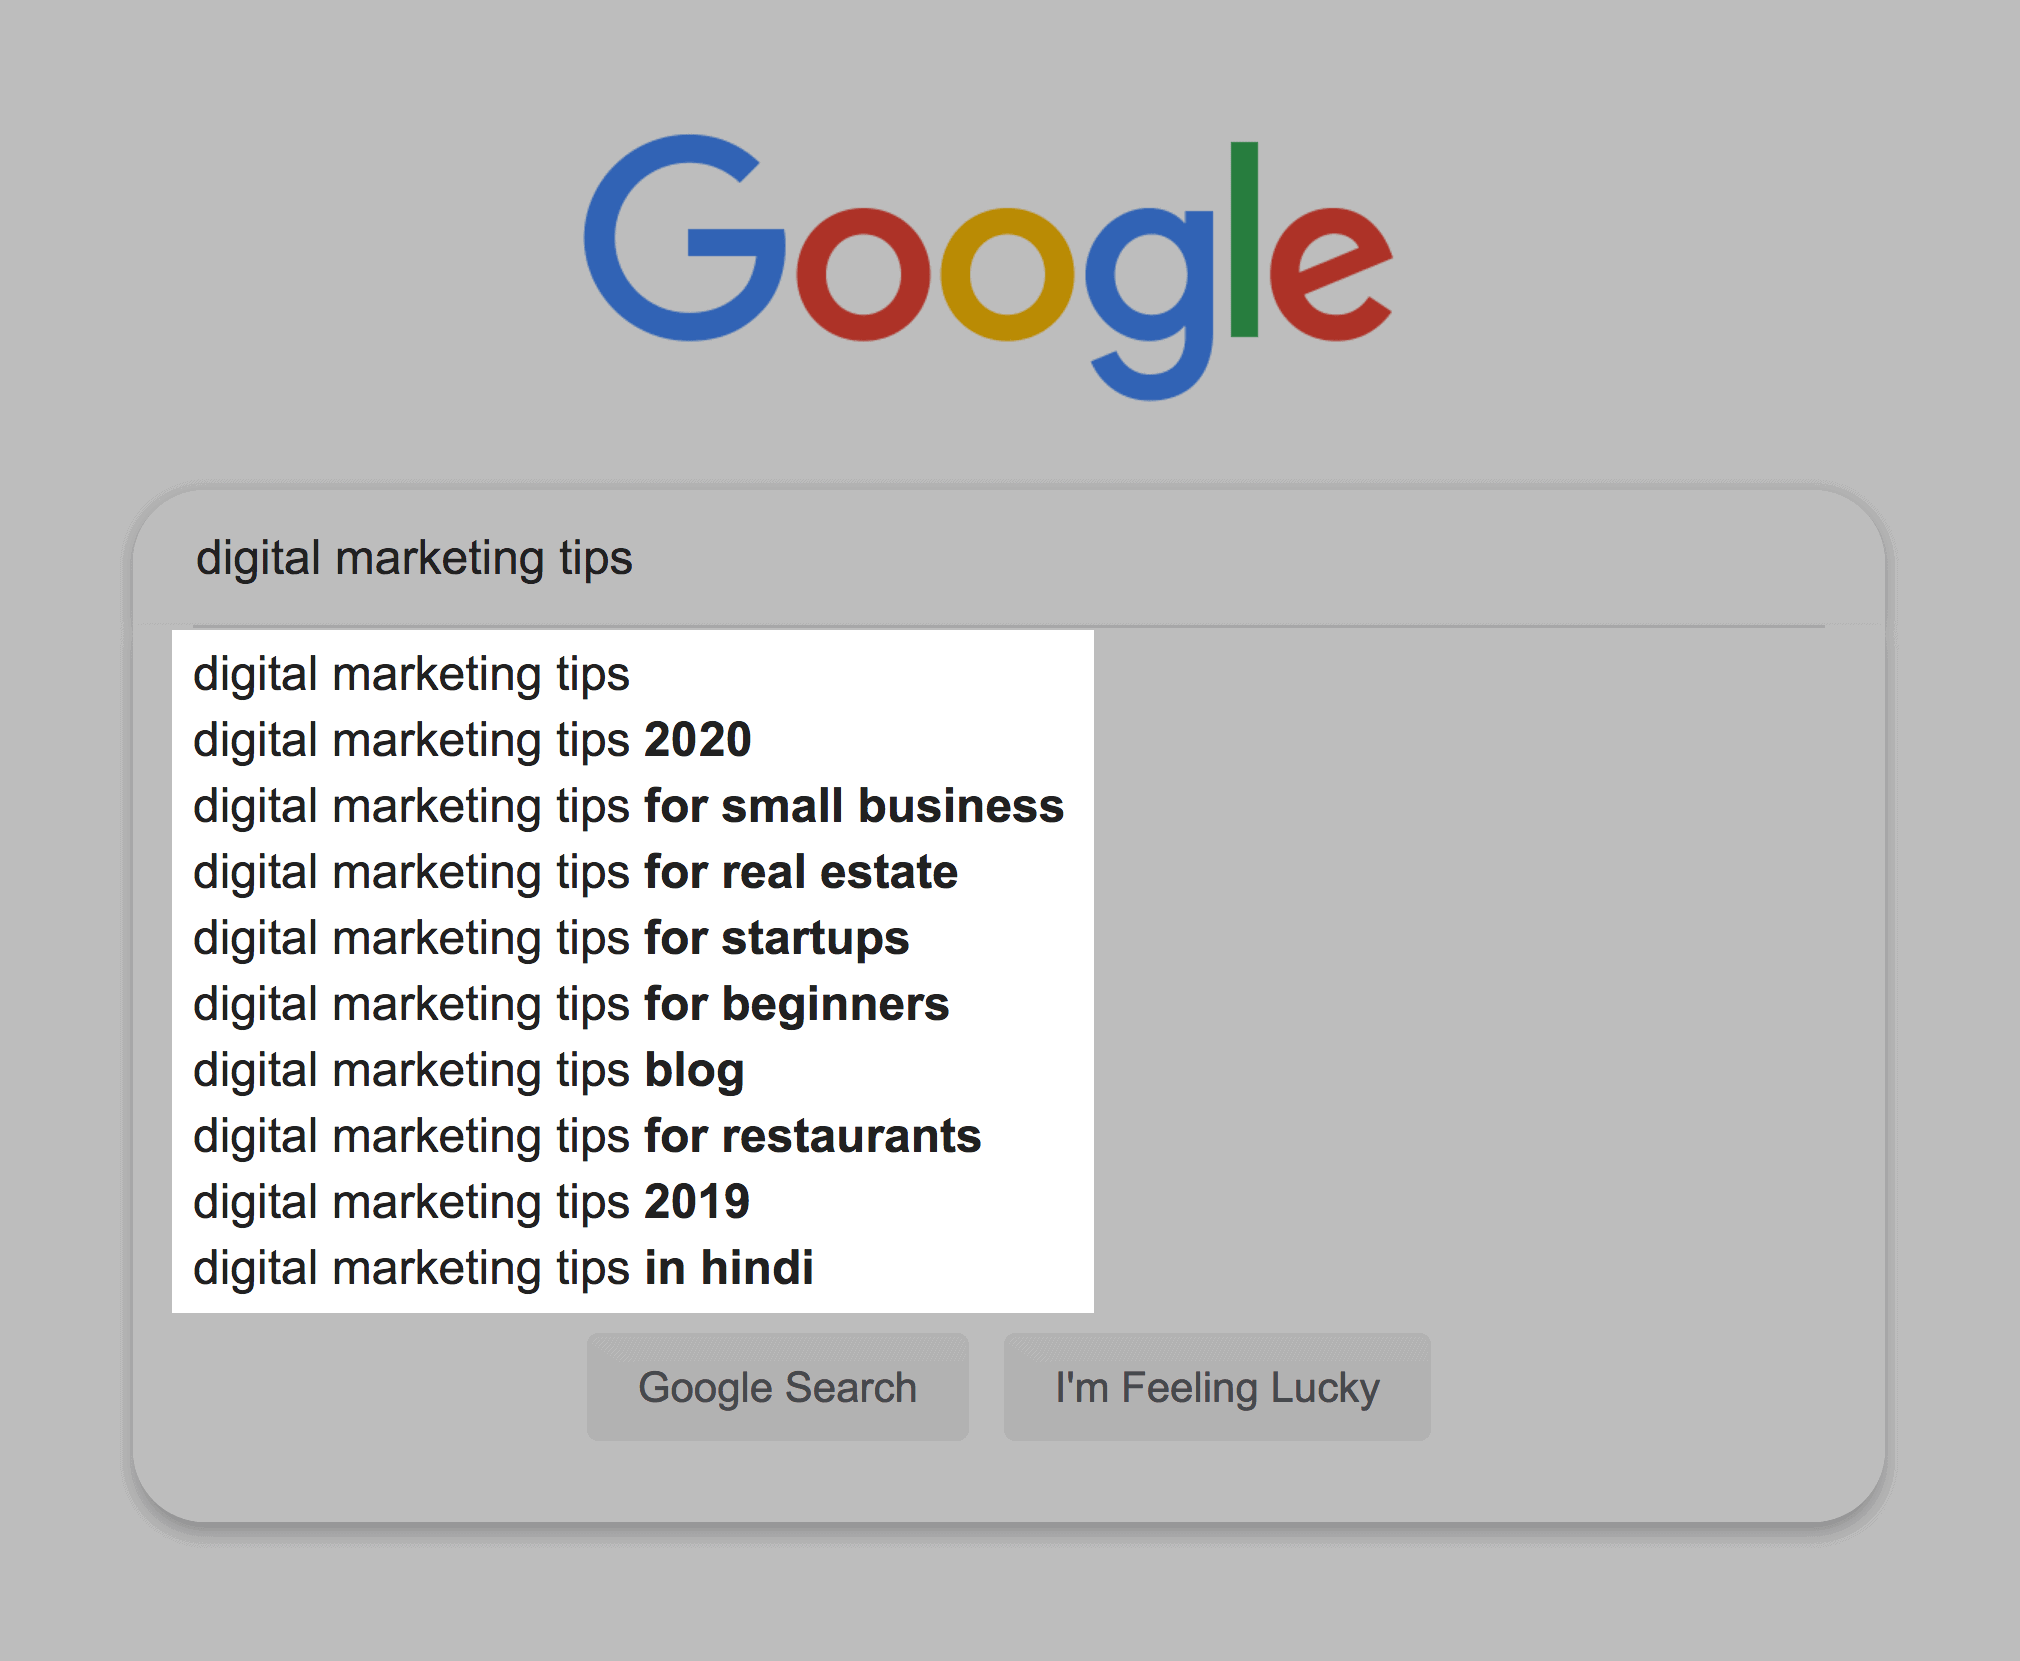 Google Suggest – Digital Marketing Tips